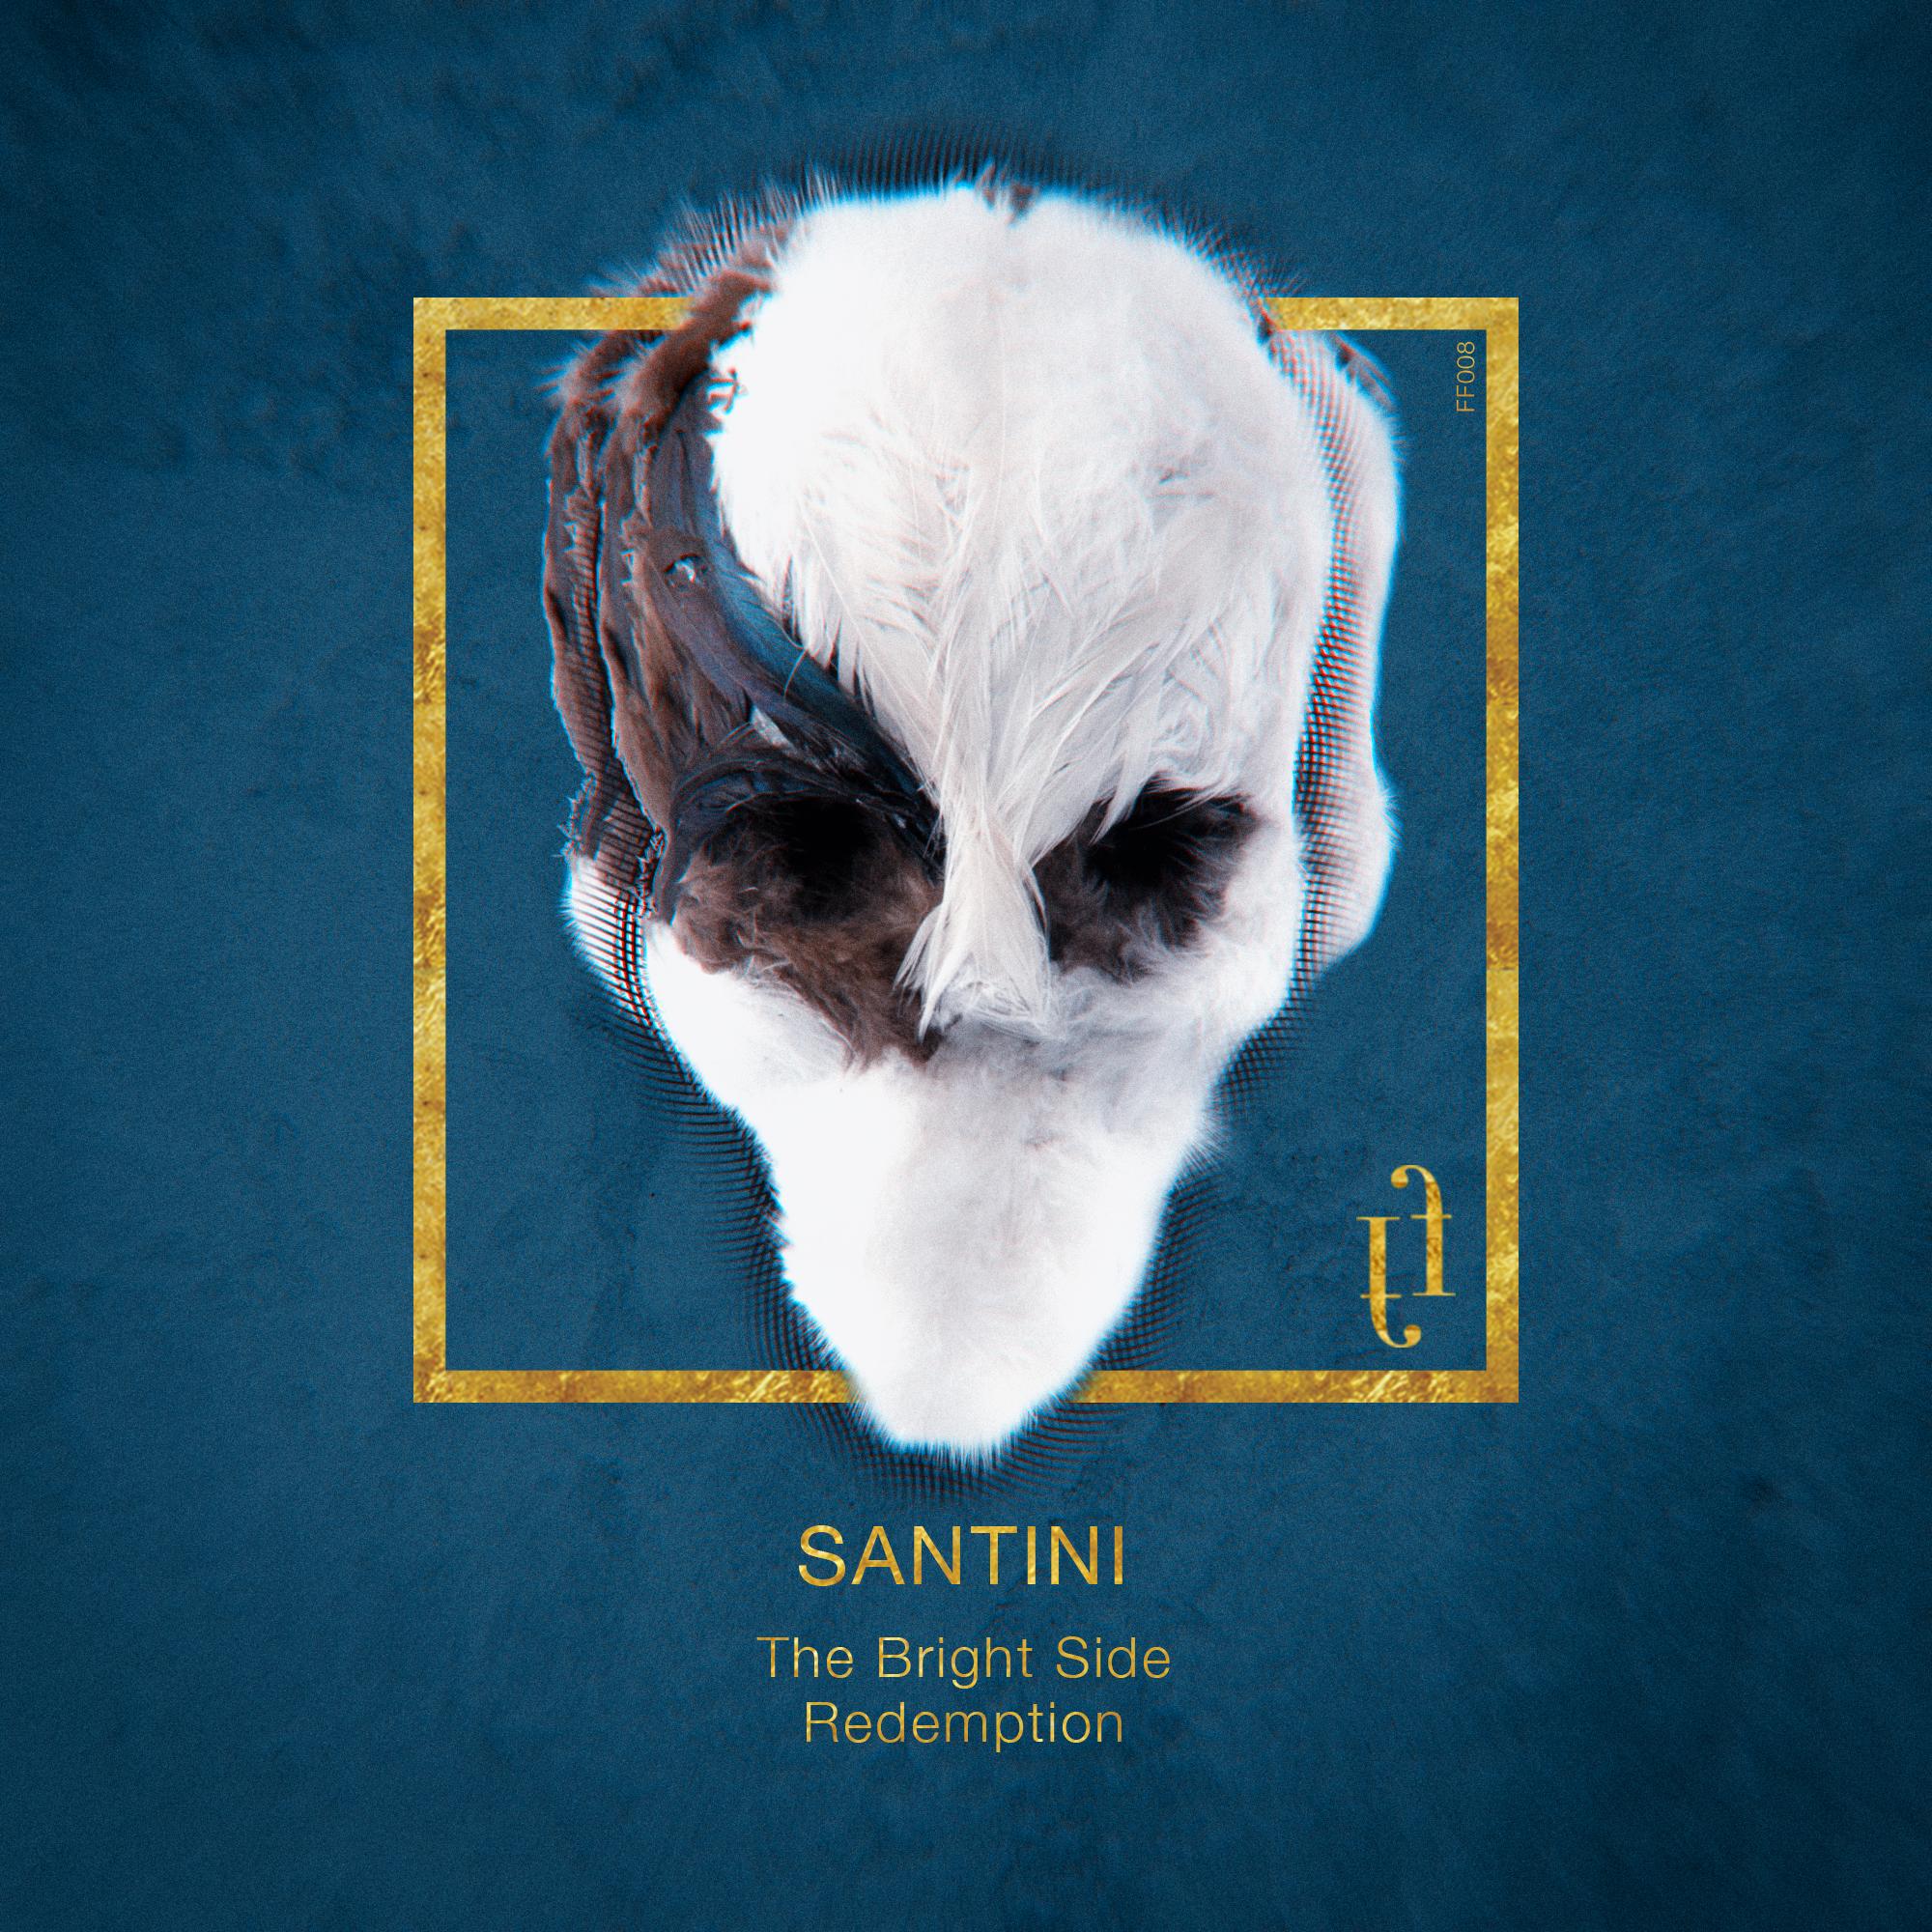 santini_-_the_bright_side_ff008_coverart.jpg